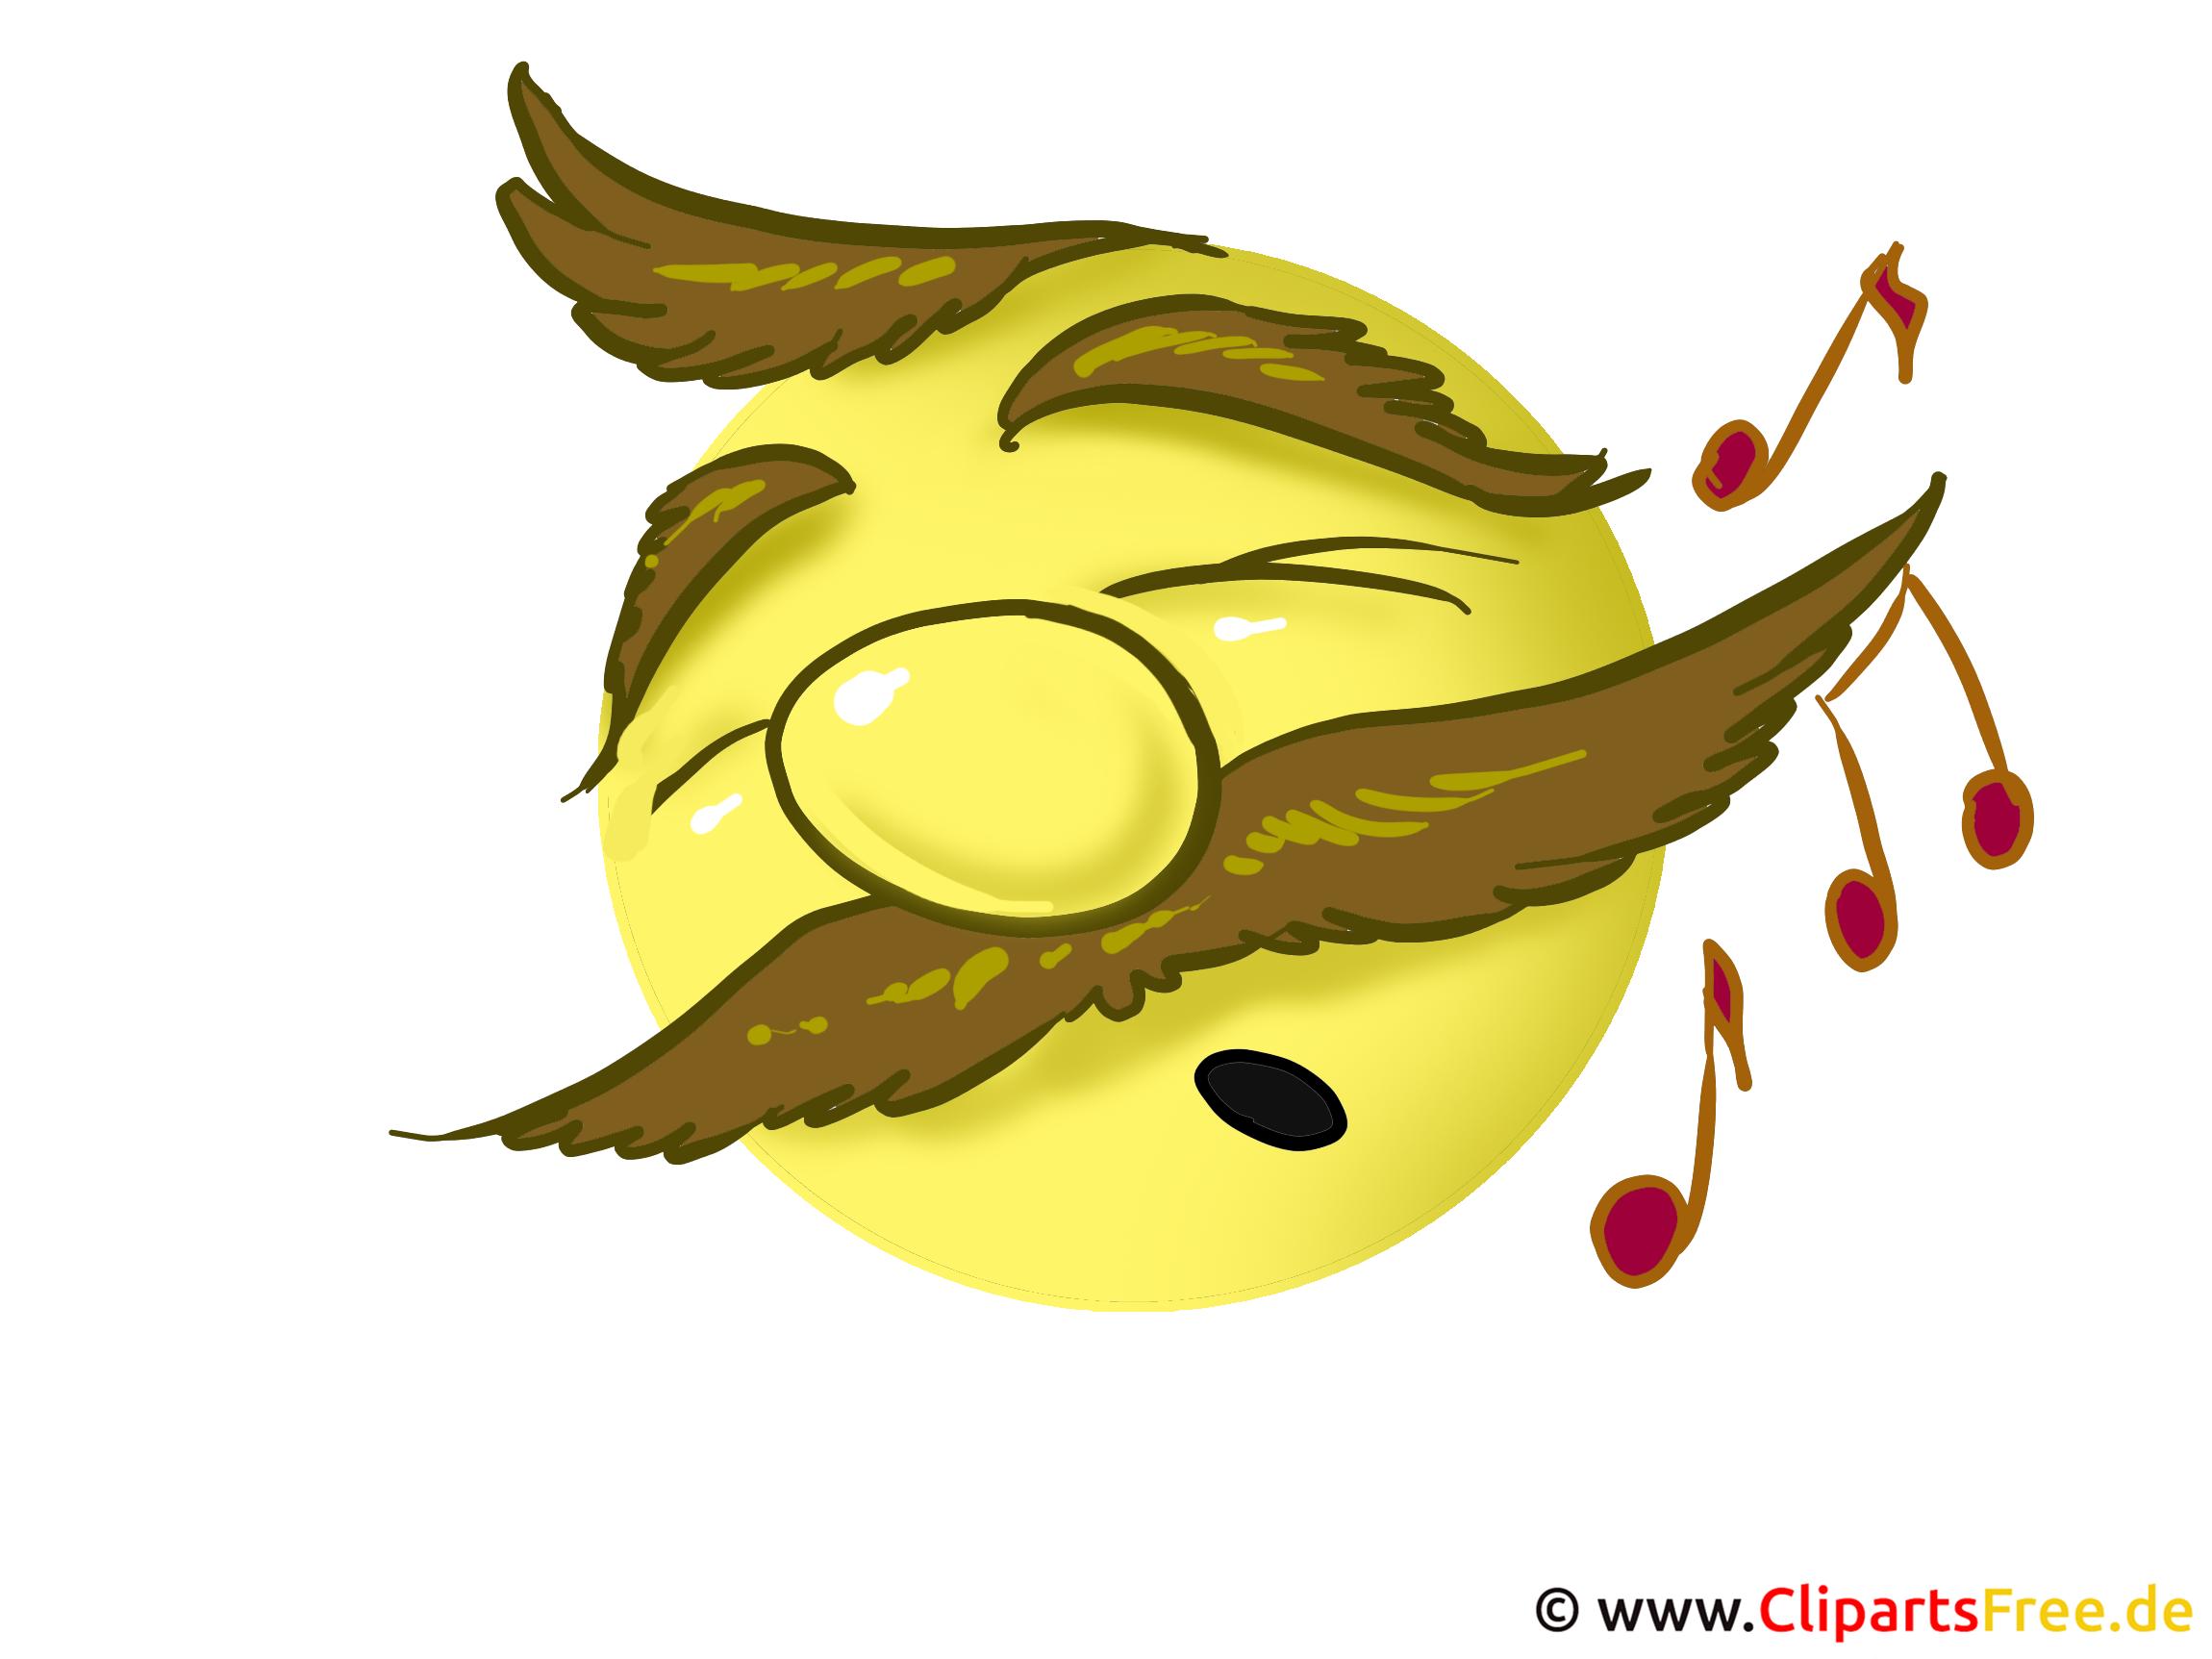 Free Emoticons download - Musik Smiley